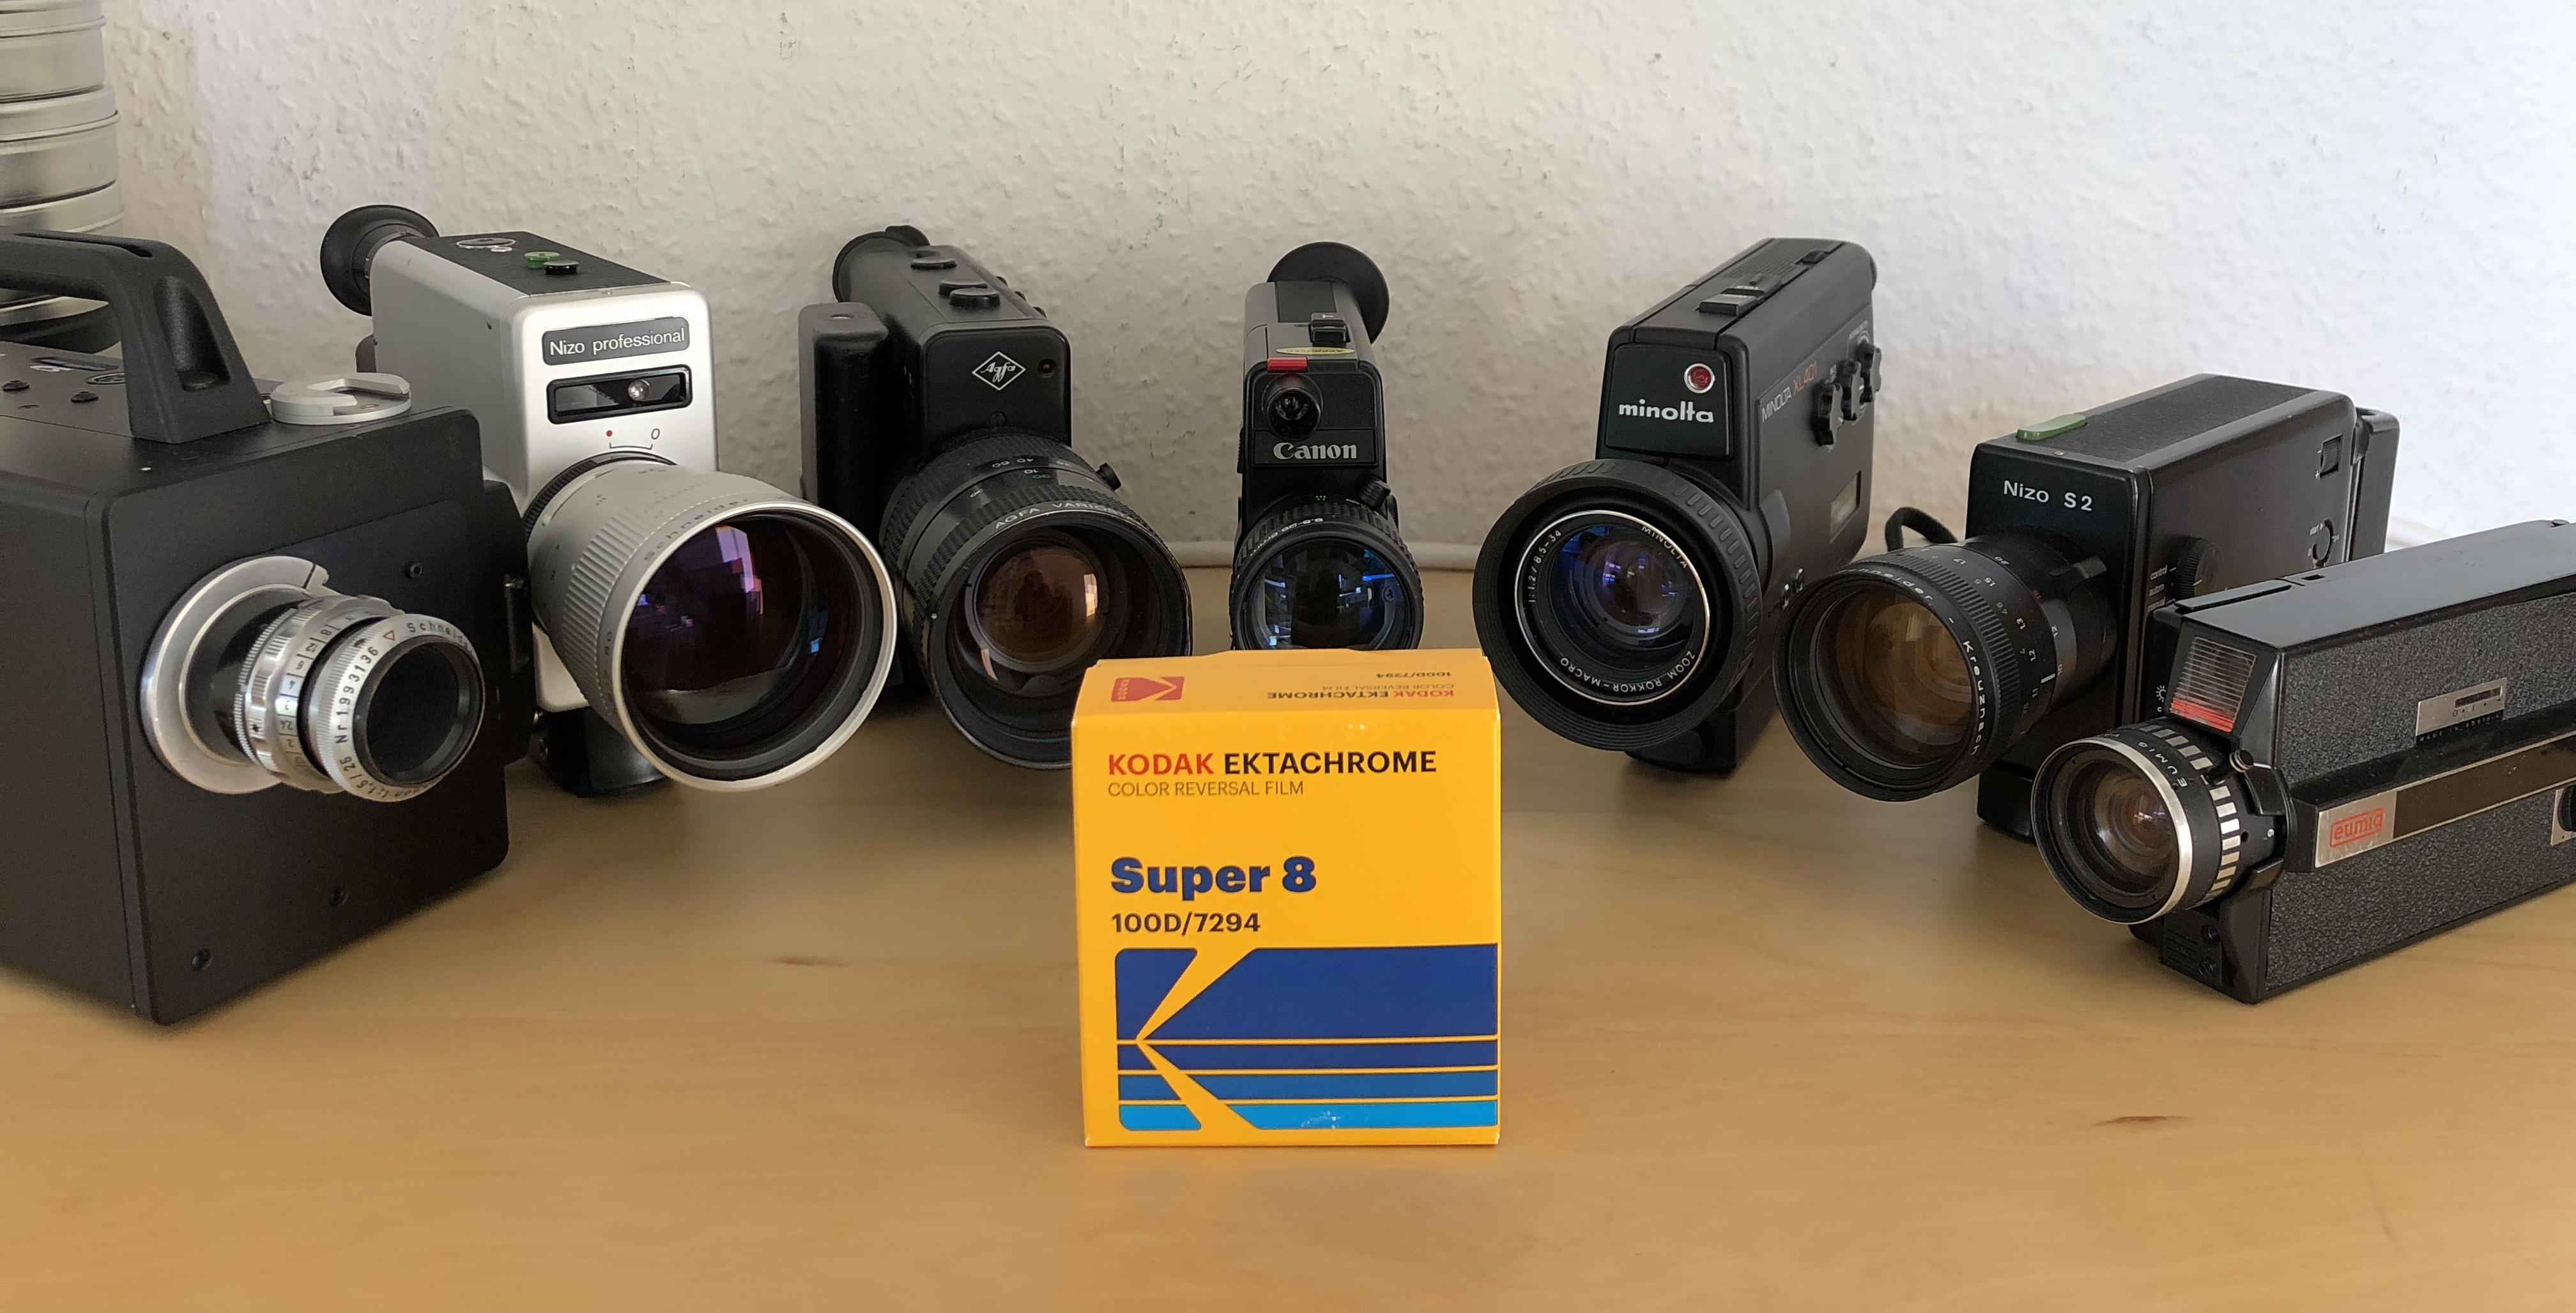 """Schaf"", schärfer, am schärfsten: Test des neuen Kodak Ektachrome 100D/7294"